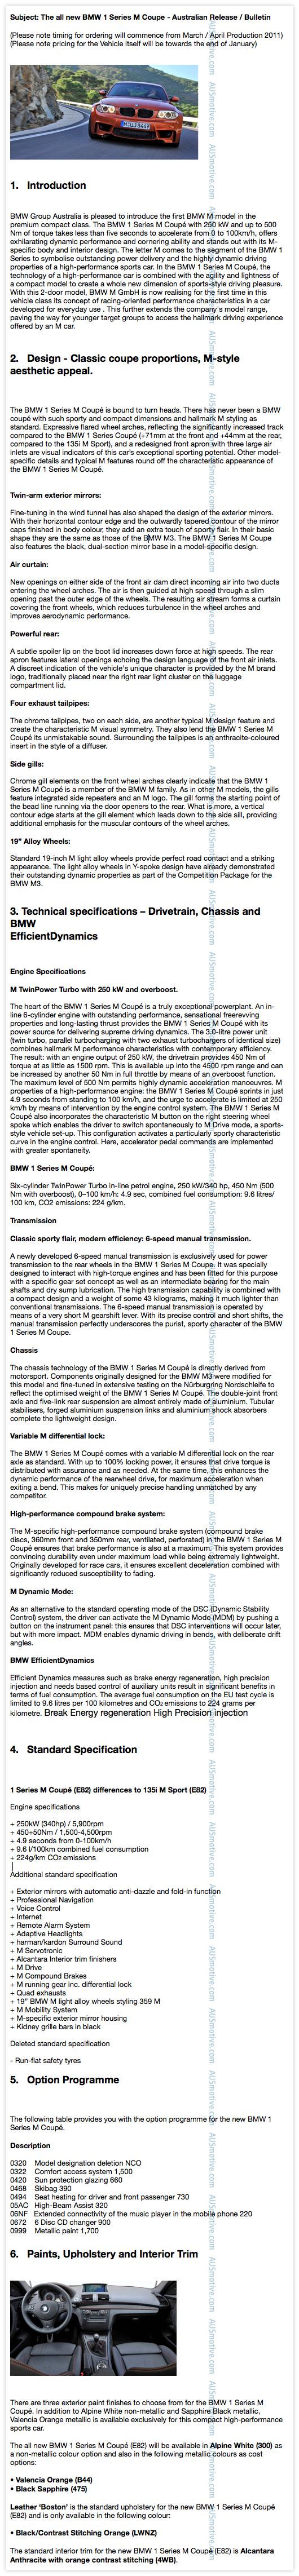 BMW 1M Coupe - Australian dealer bulletin